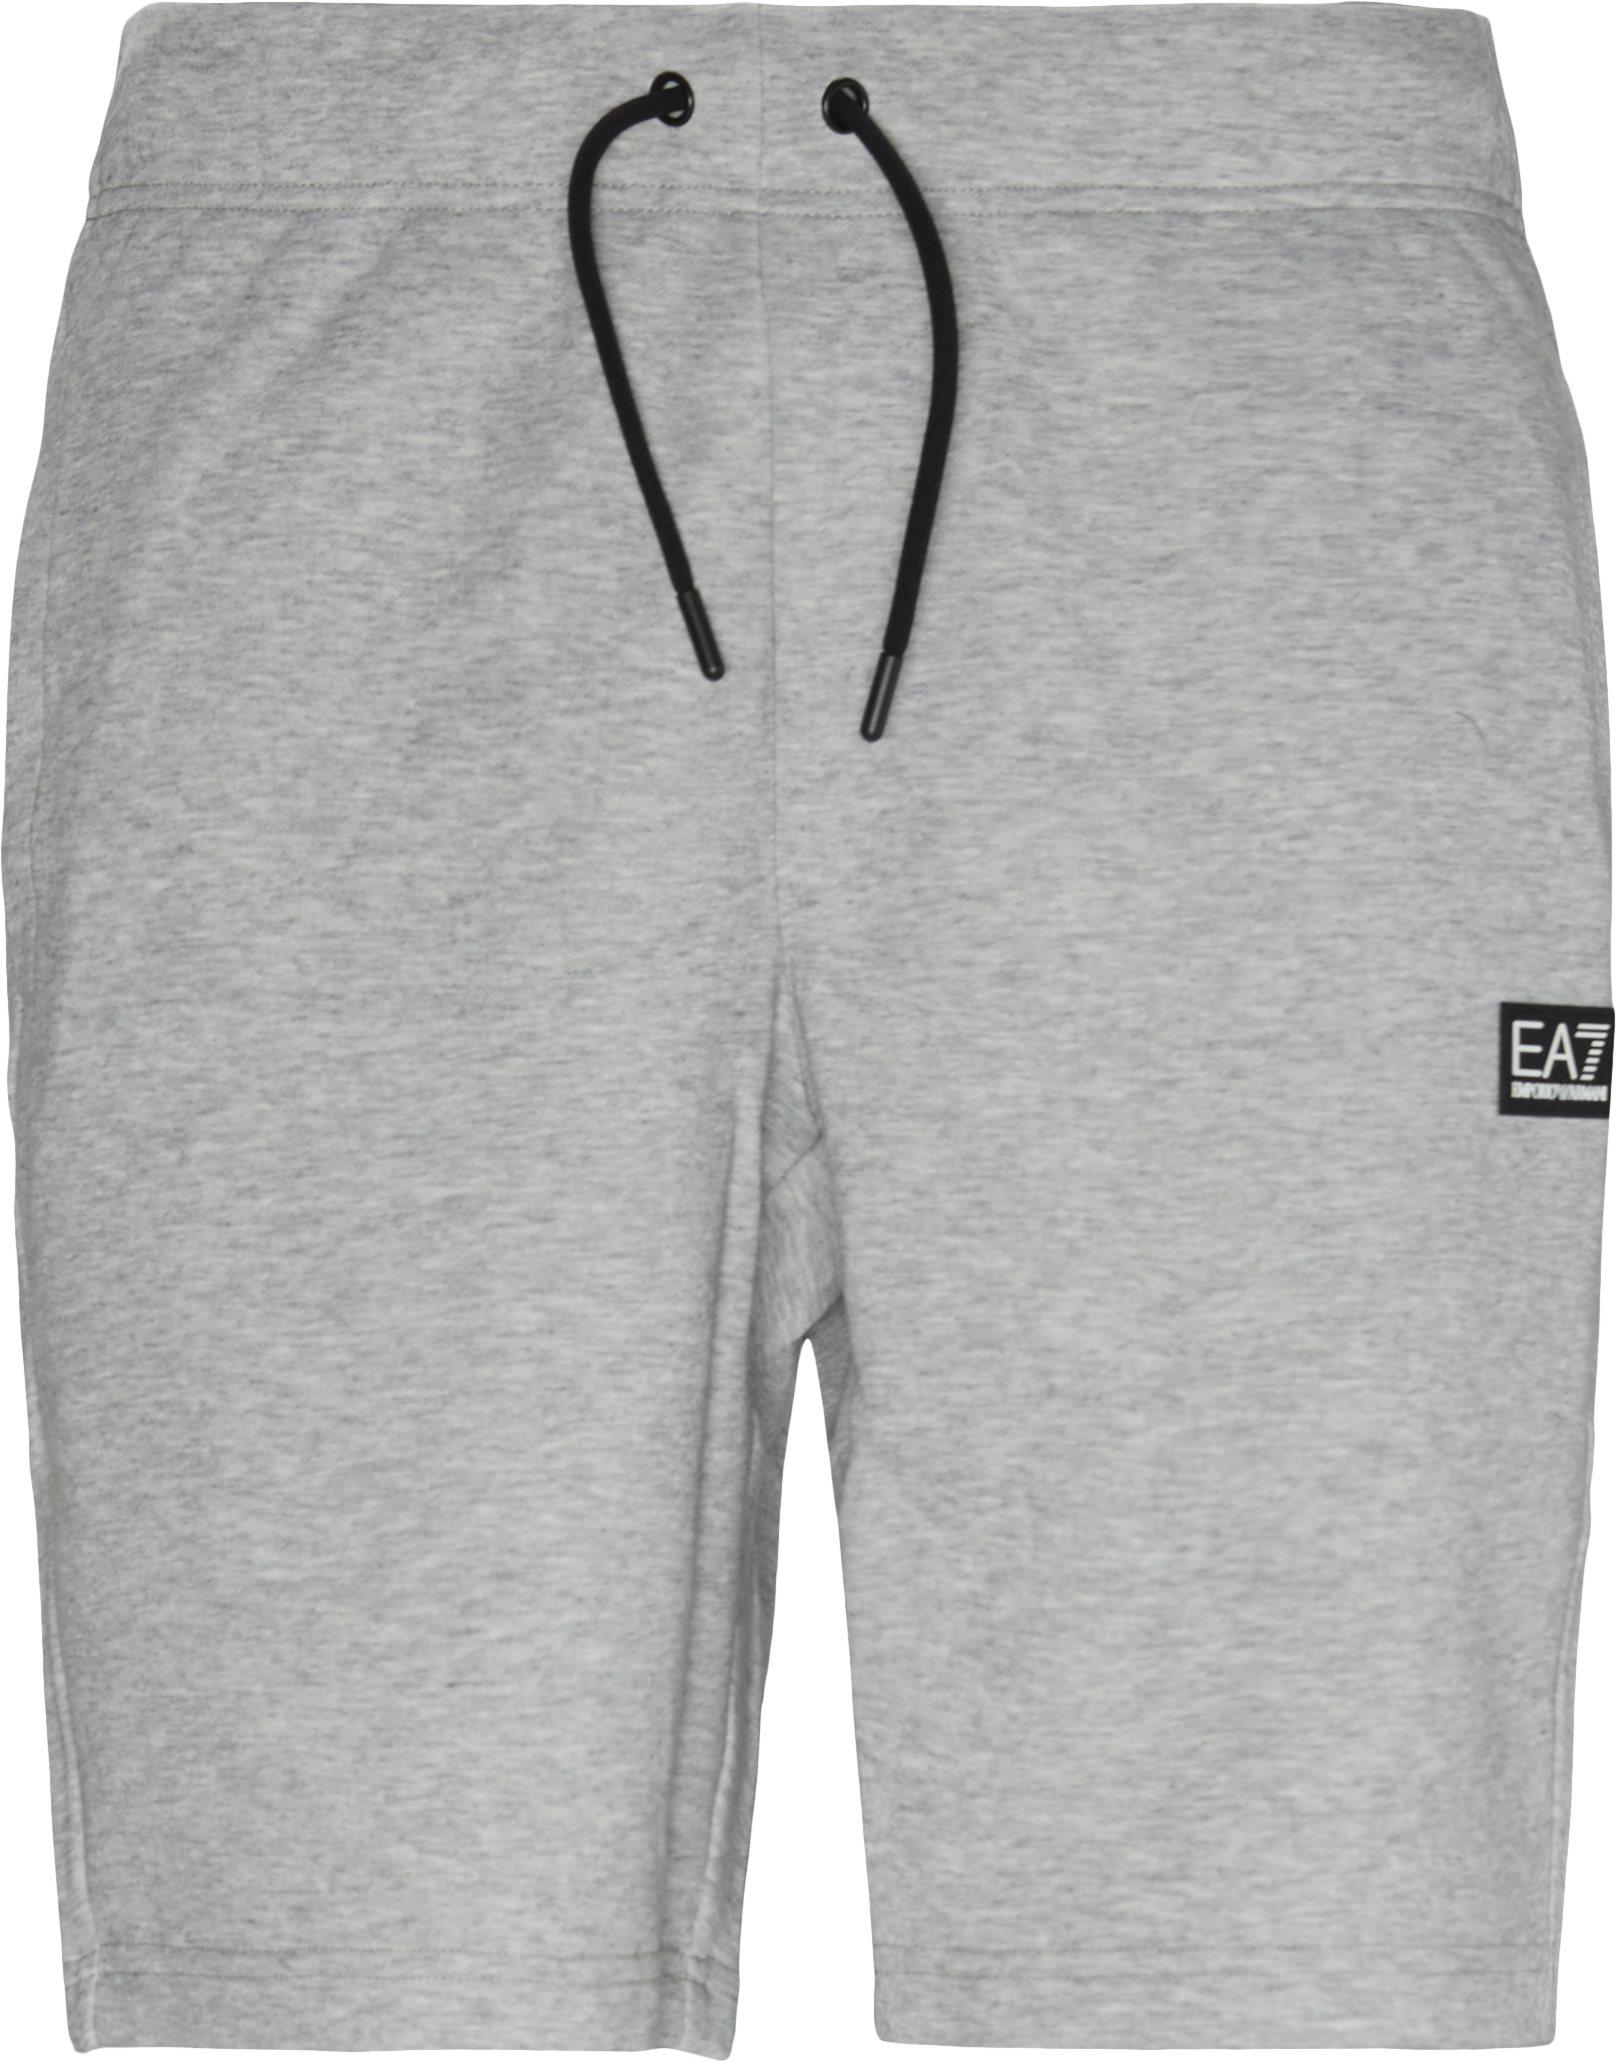 Shorts - Grå